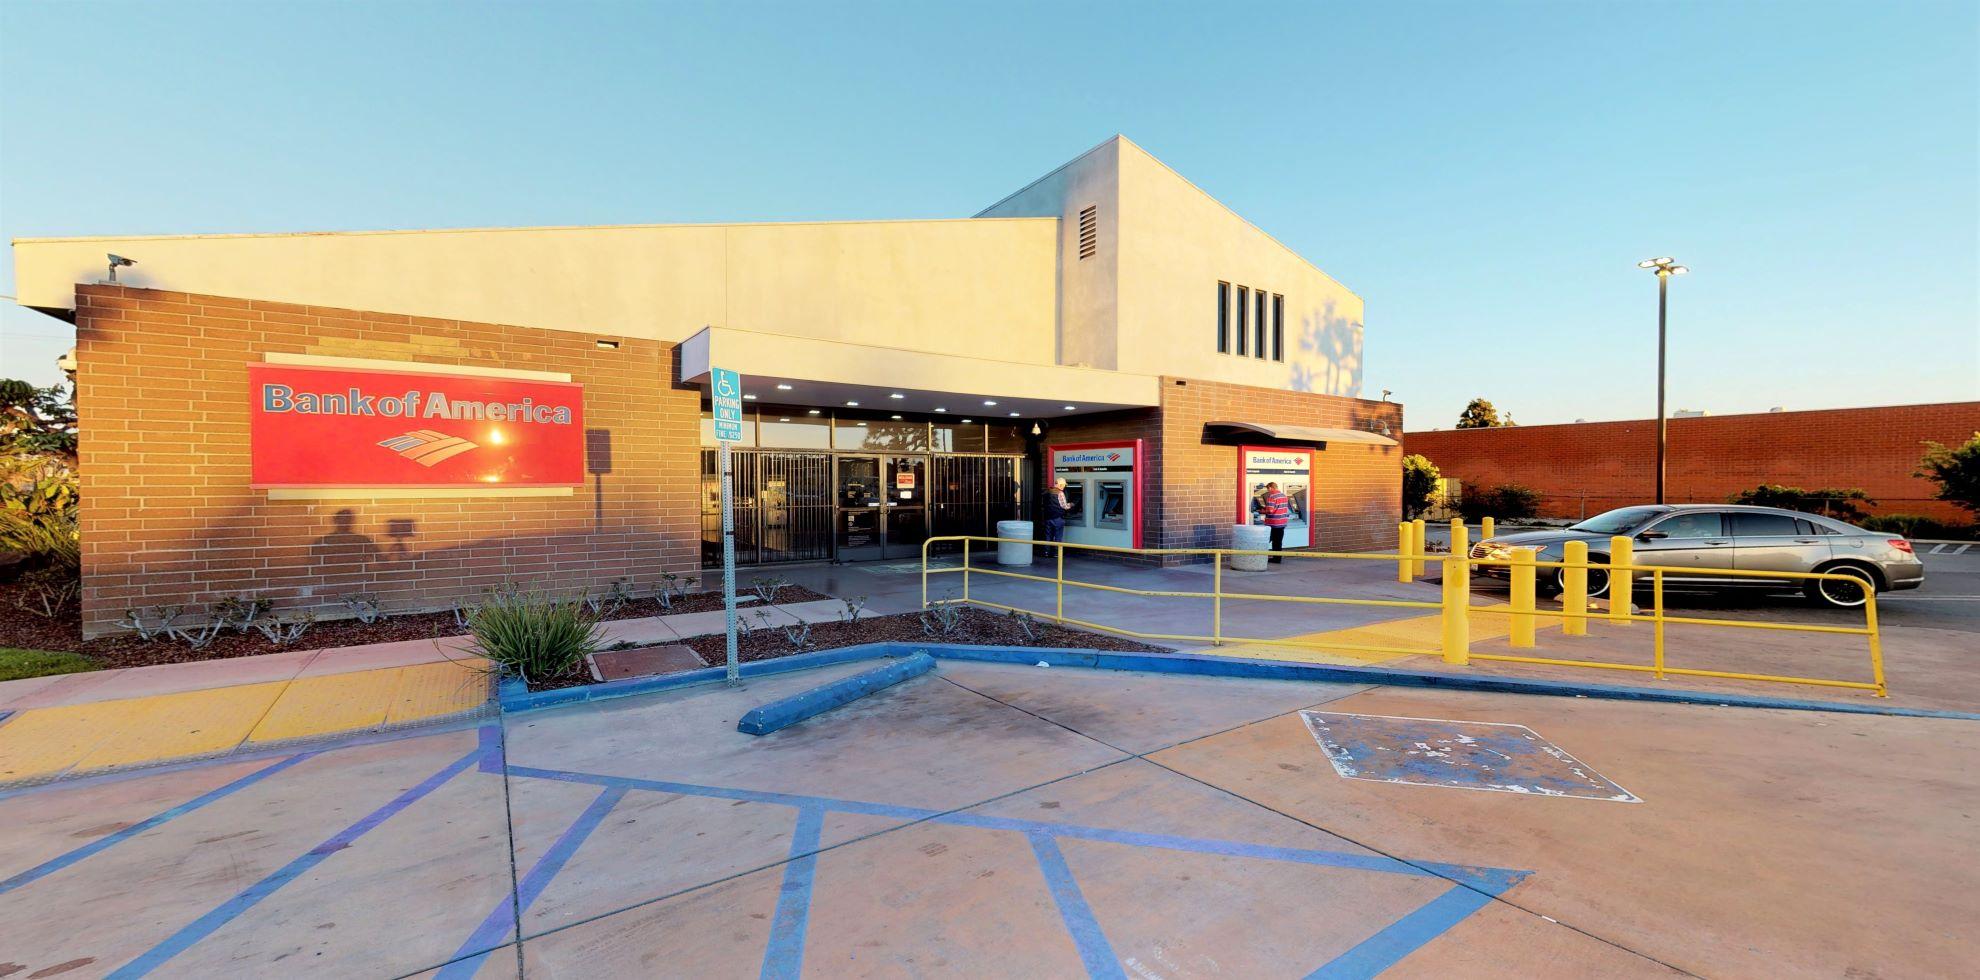 Bank of America financial center with walk-up ATM   118 W Rosecrans Ave, Gardena, CA 90248